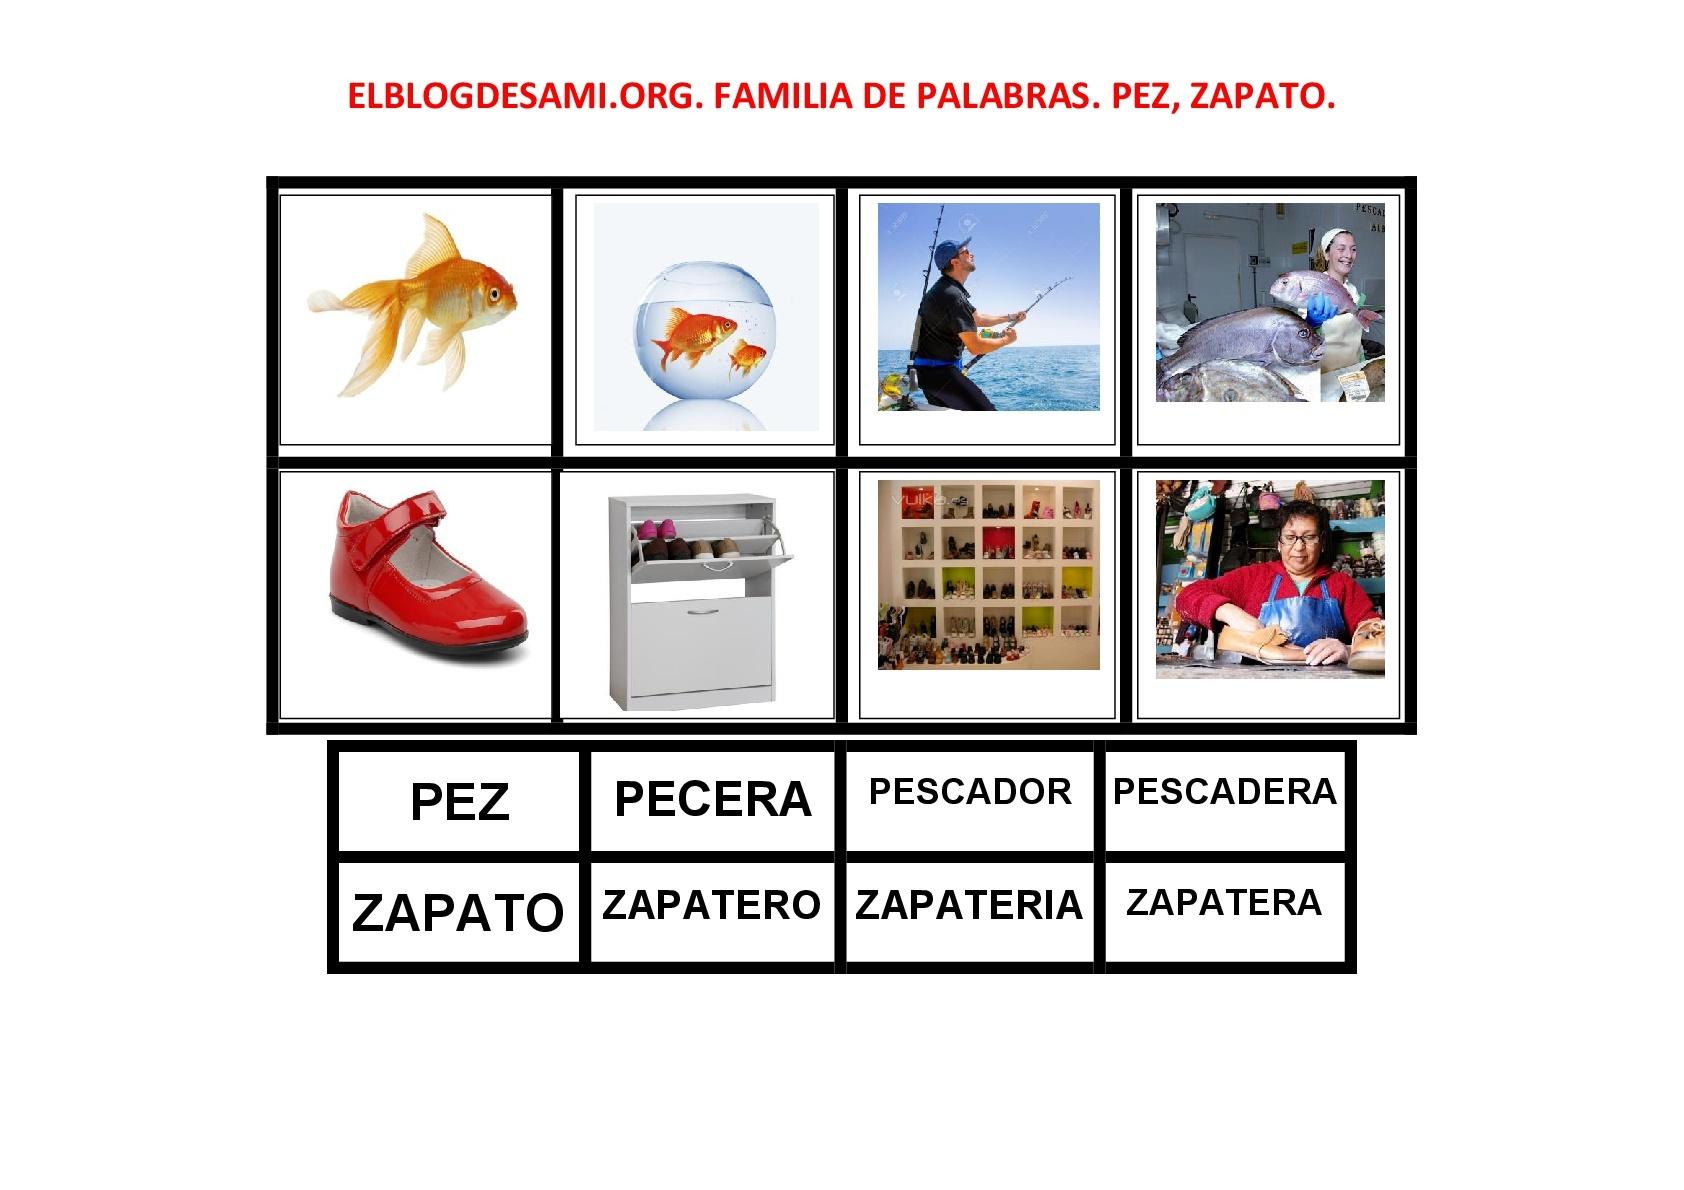 org Palabras Vocabulario 001 Elblogdesami Familia Zapato 1 Pez De PwTqxd4